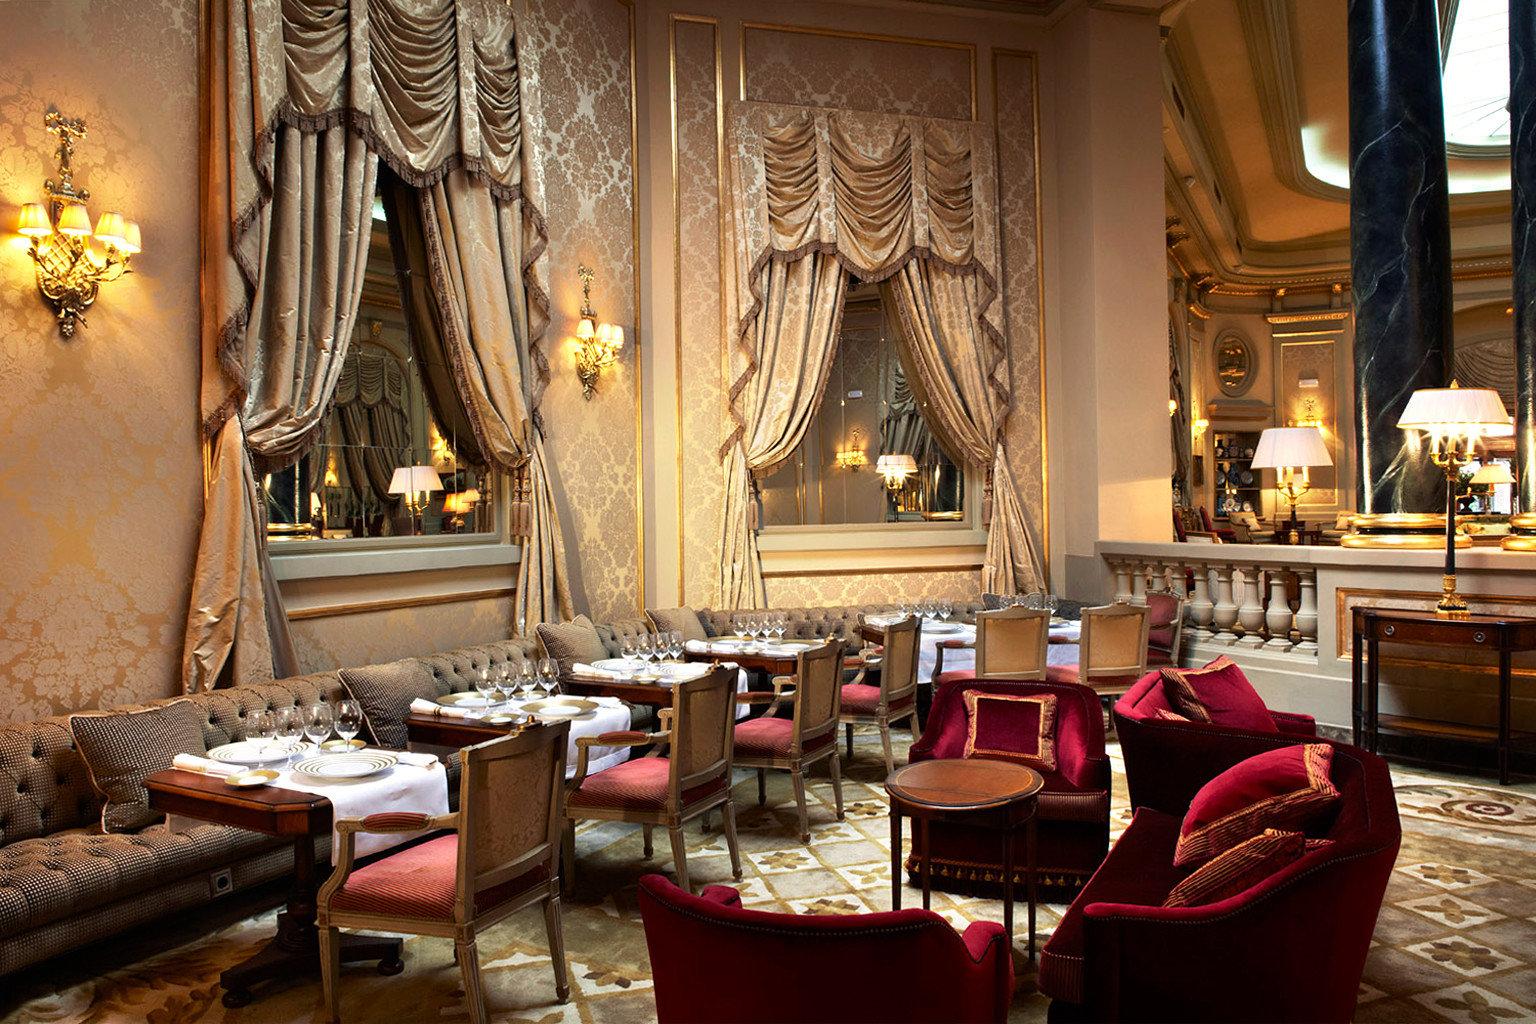 City Classic Dining Drink Eat Elegant Luxury Romantic chair restaurant Lobby palace living room function hall ballroom